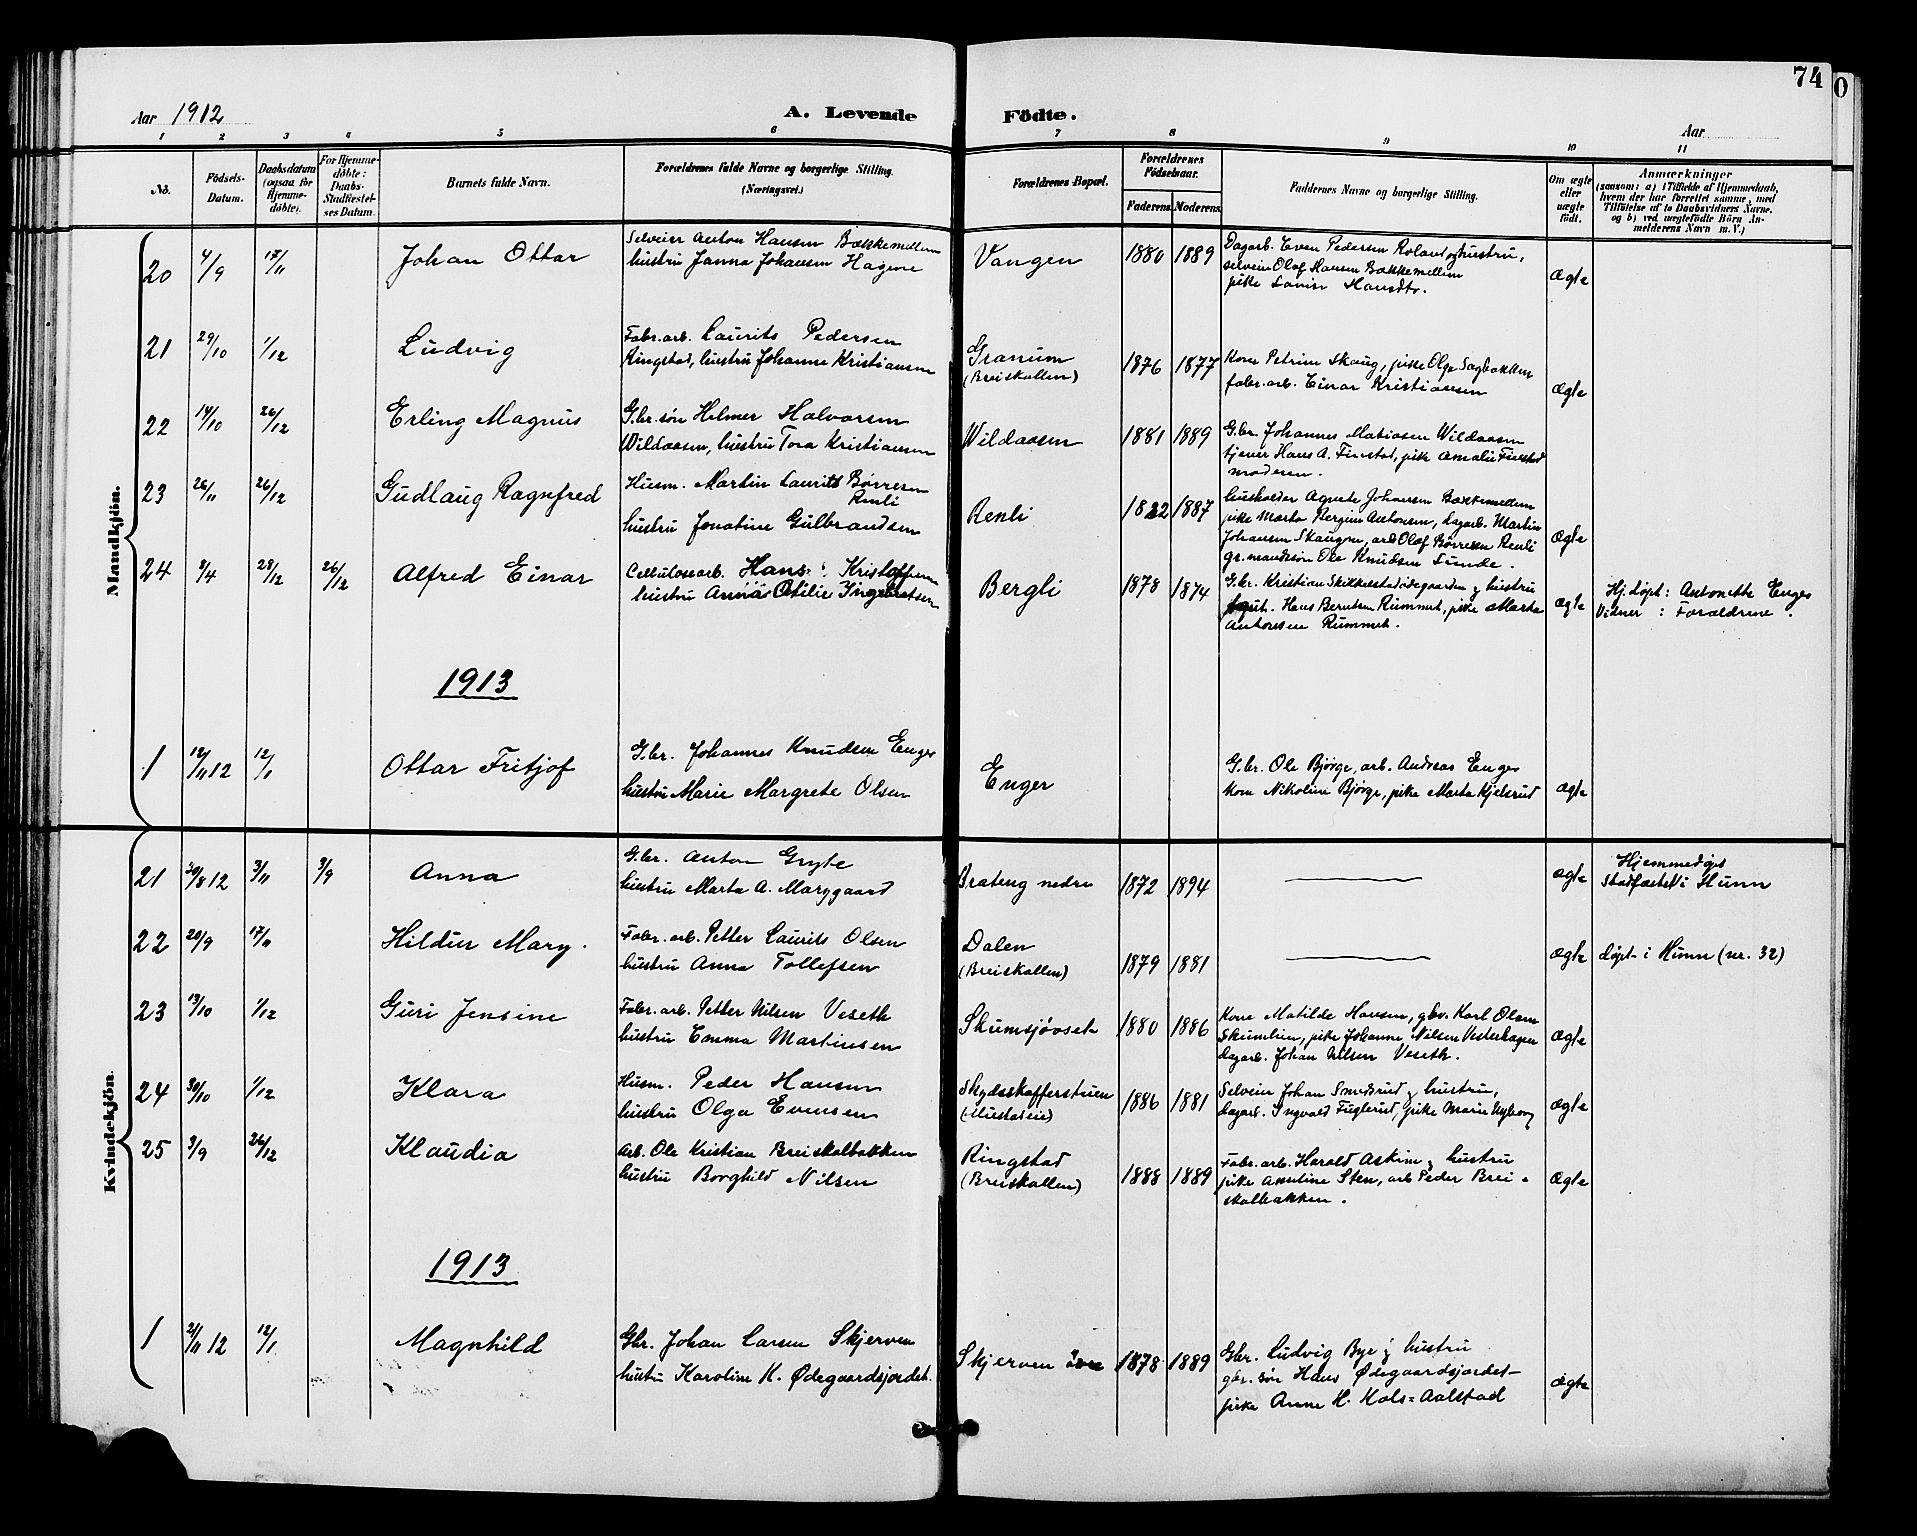 SAH, Vardal prestekontor, H/Ha/Hab/L0011: Klokkerbok nr. 11, 1899-1913, s. 74